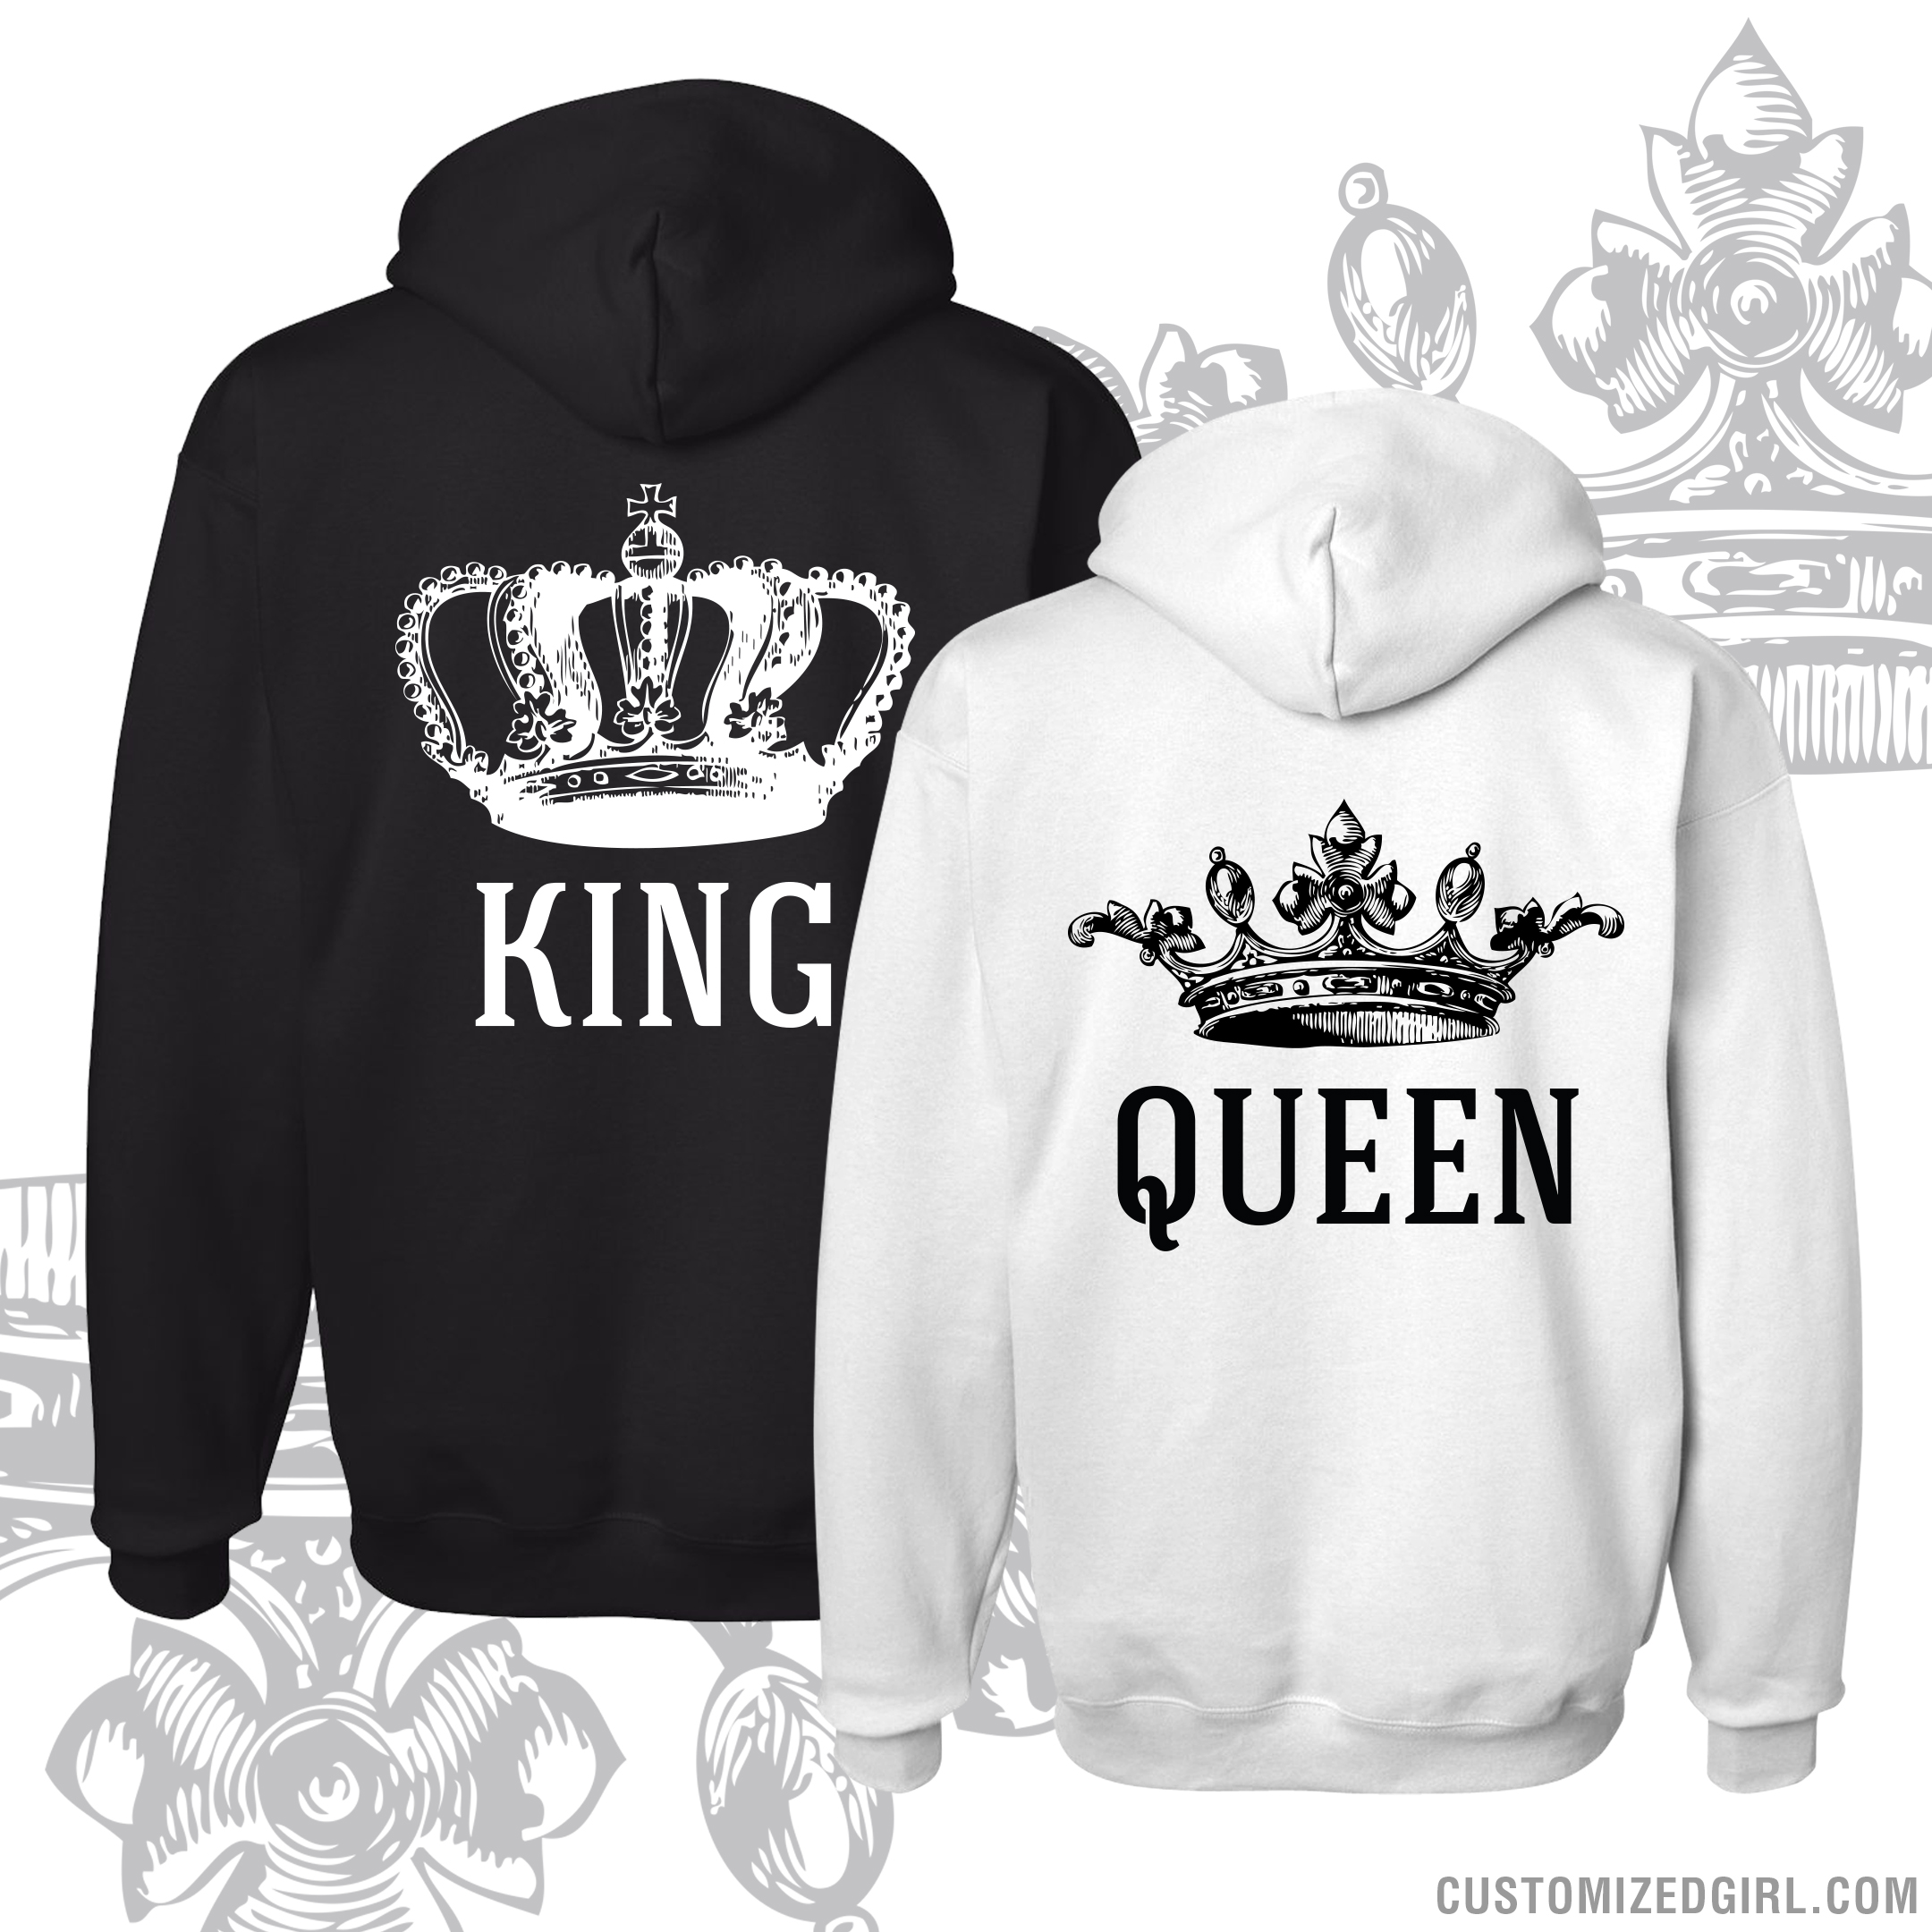 vintage king queen hoodies 1. Black Bedroom Furniture Sets. Home Design Ideas